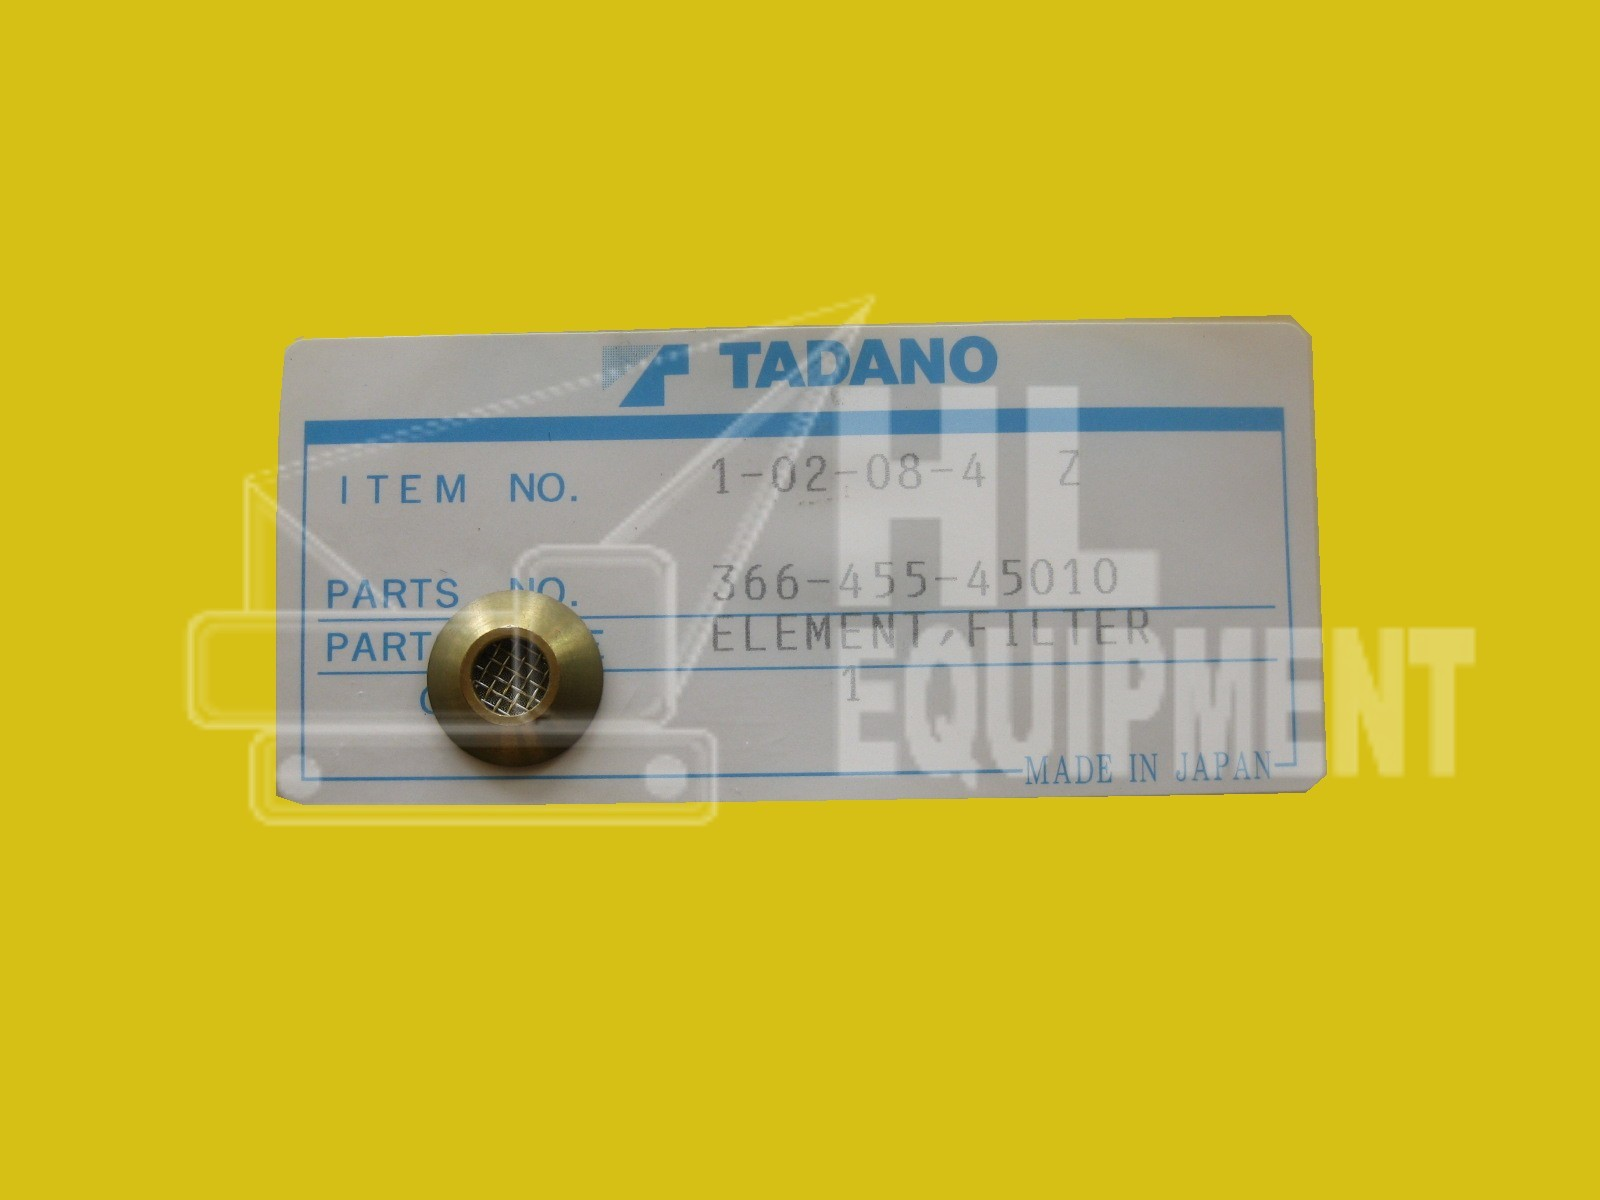 Tadano Filter Element